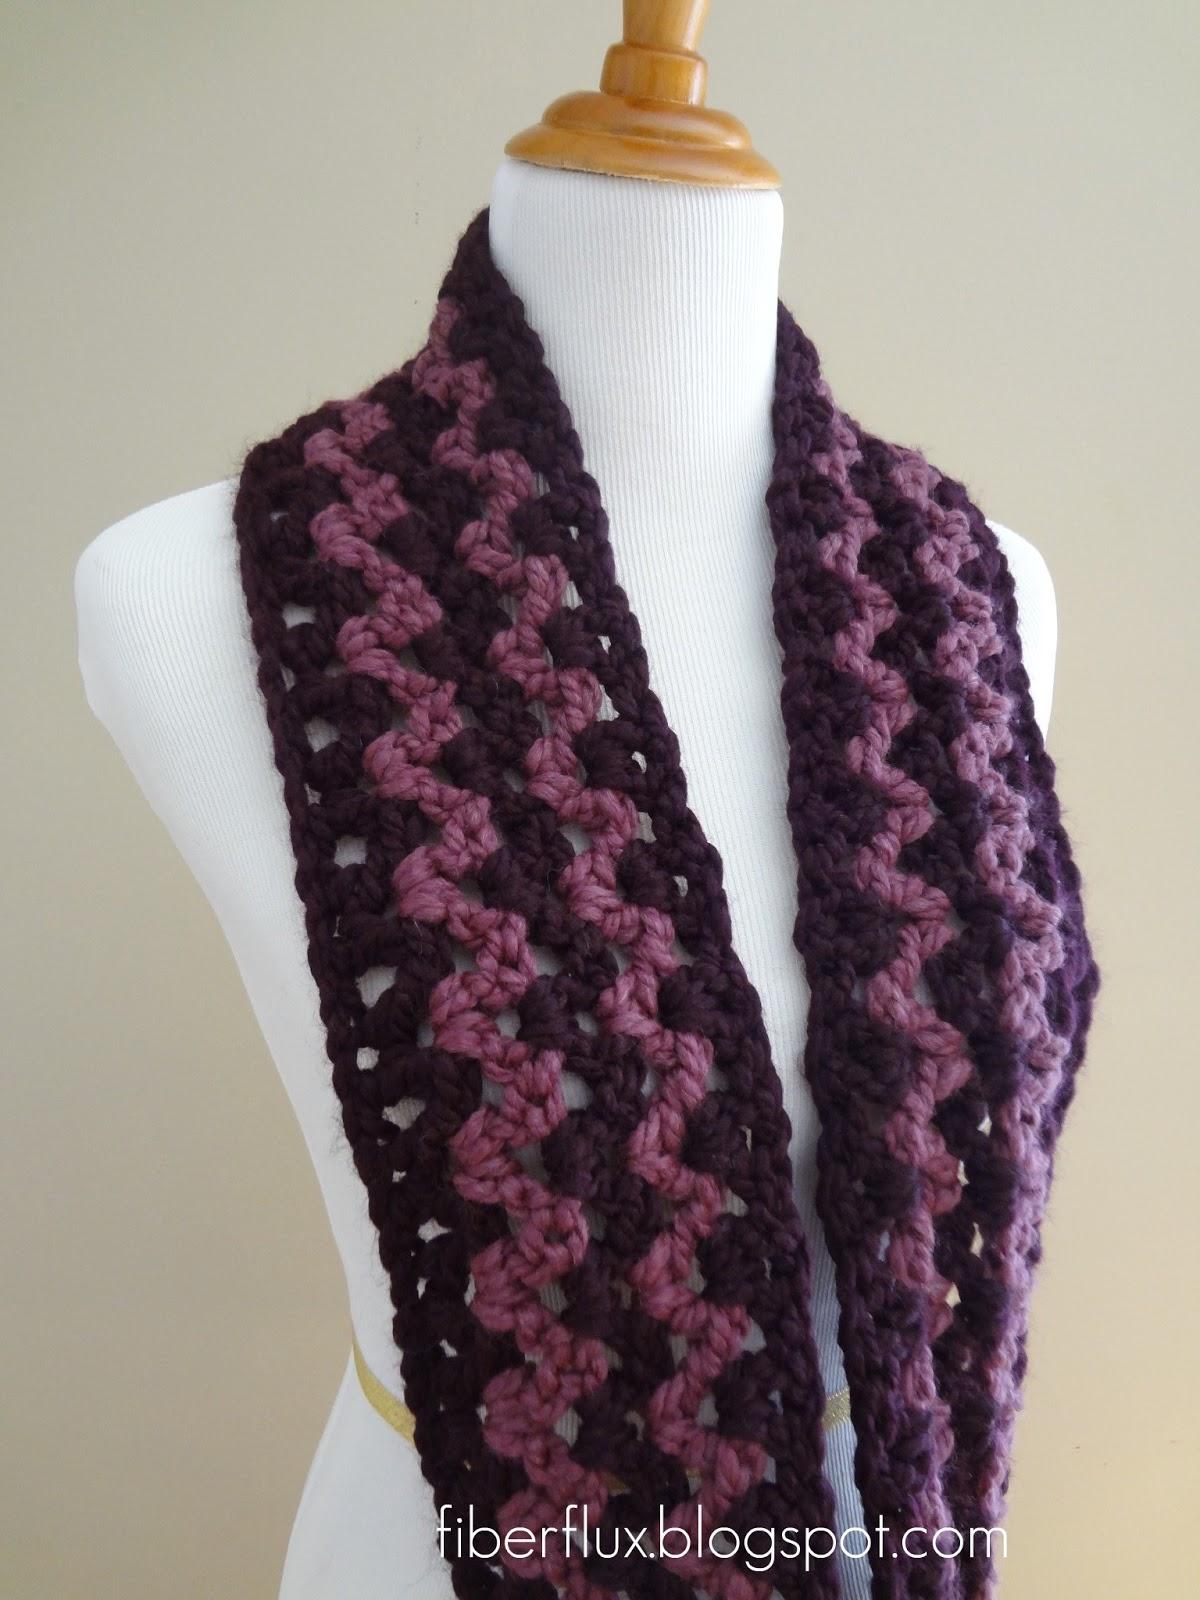 Free Crochet Pattern Pavement Infinity Scarf : Fiber Flux: Free Crochet Pattern...Pinot Noir Infinity Scarf